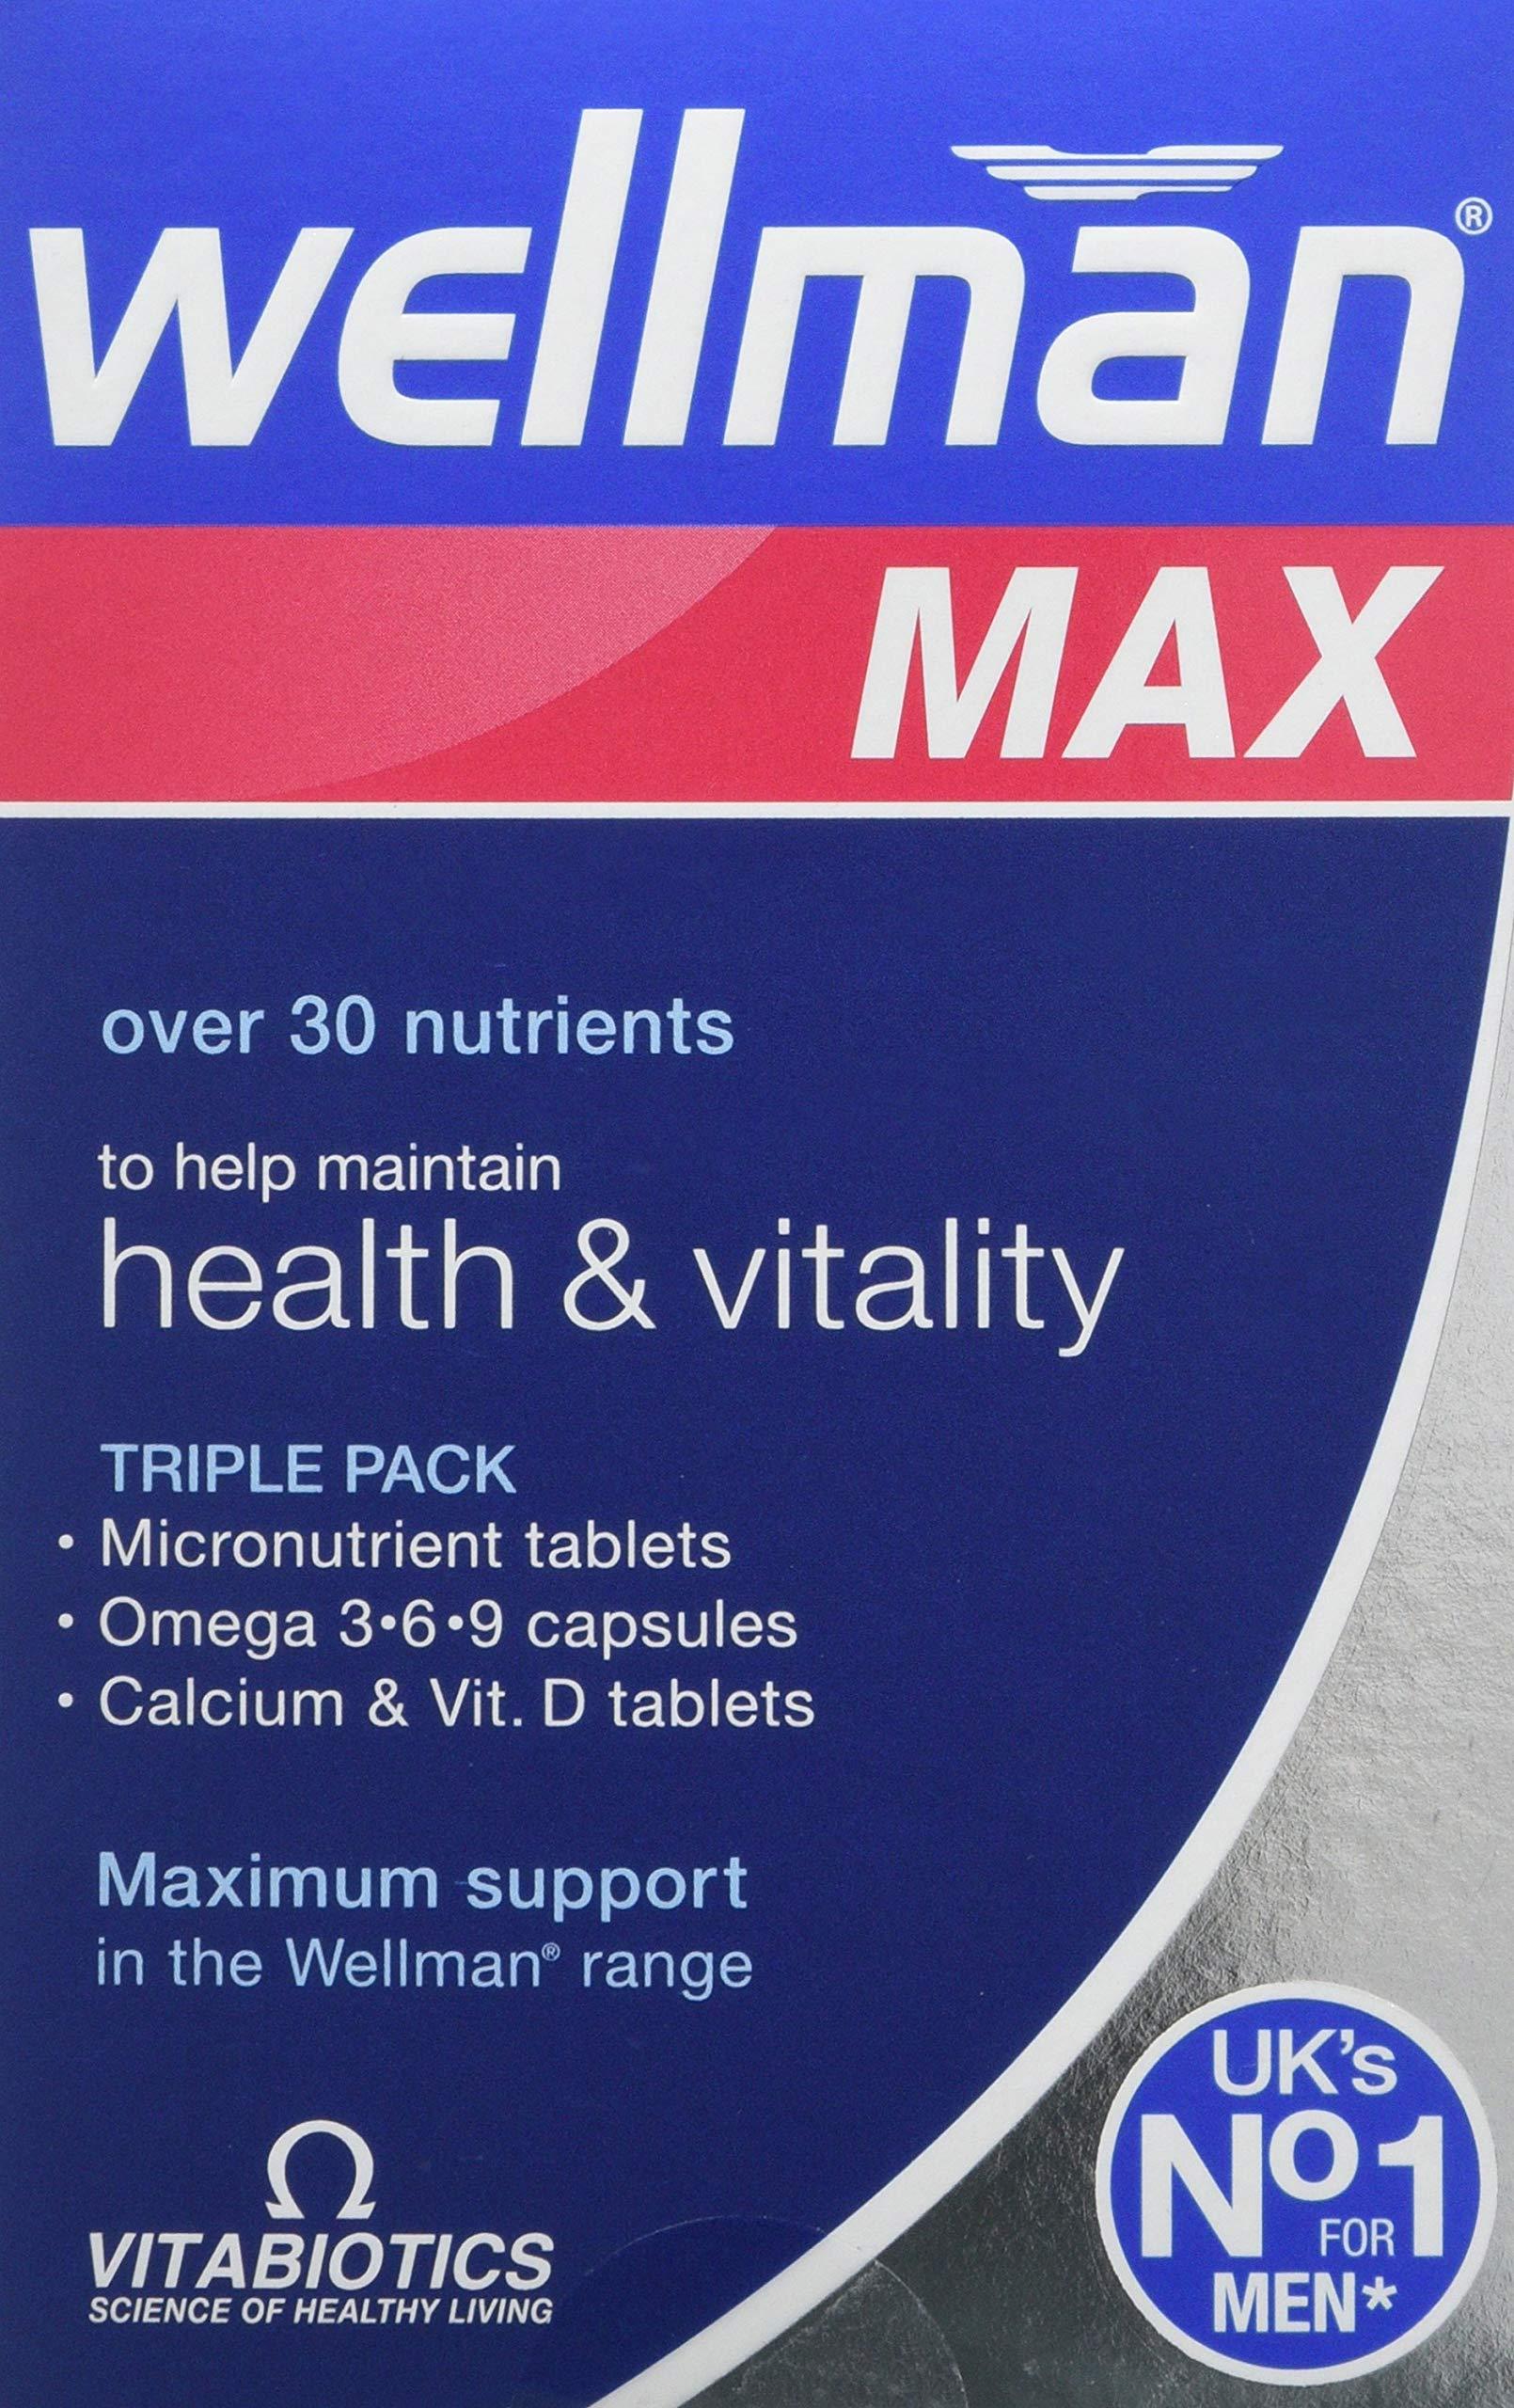 Vitabiotics Wellman Max - 84 Tablets/Capsules